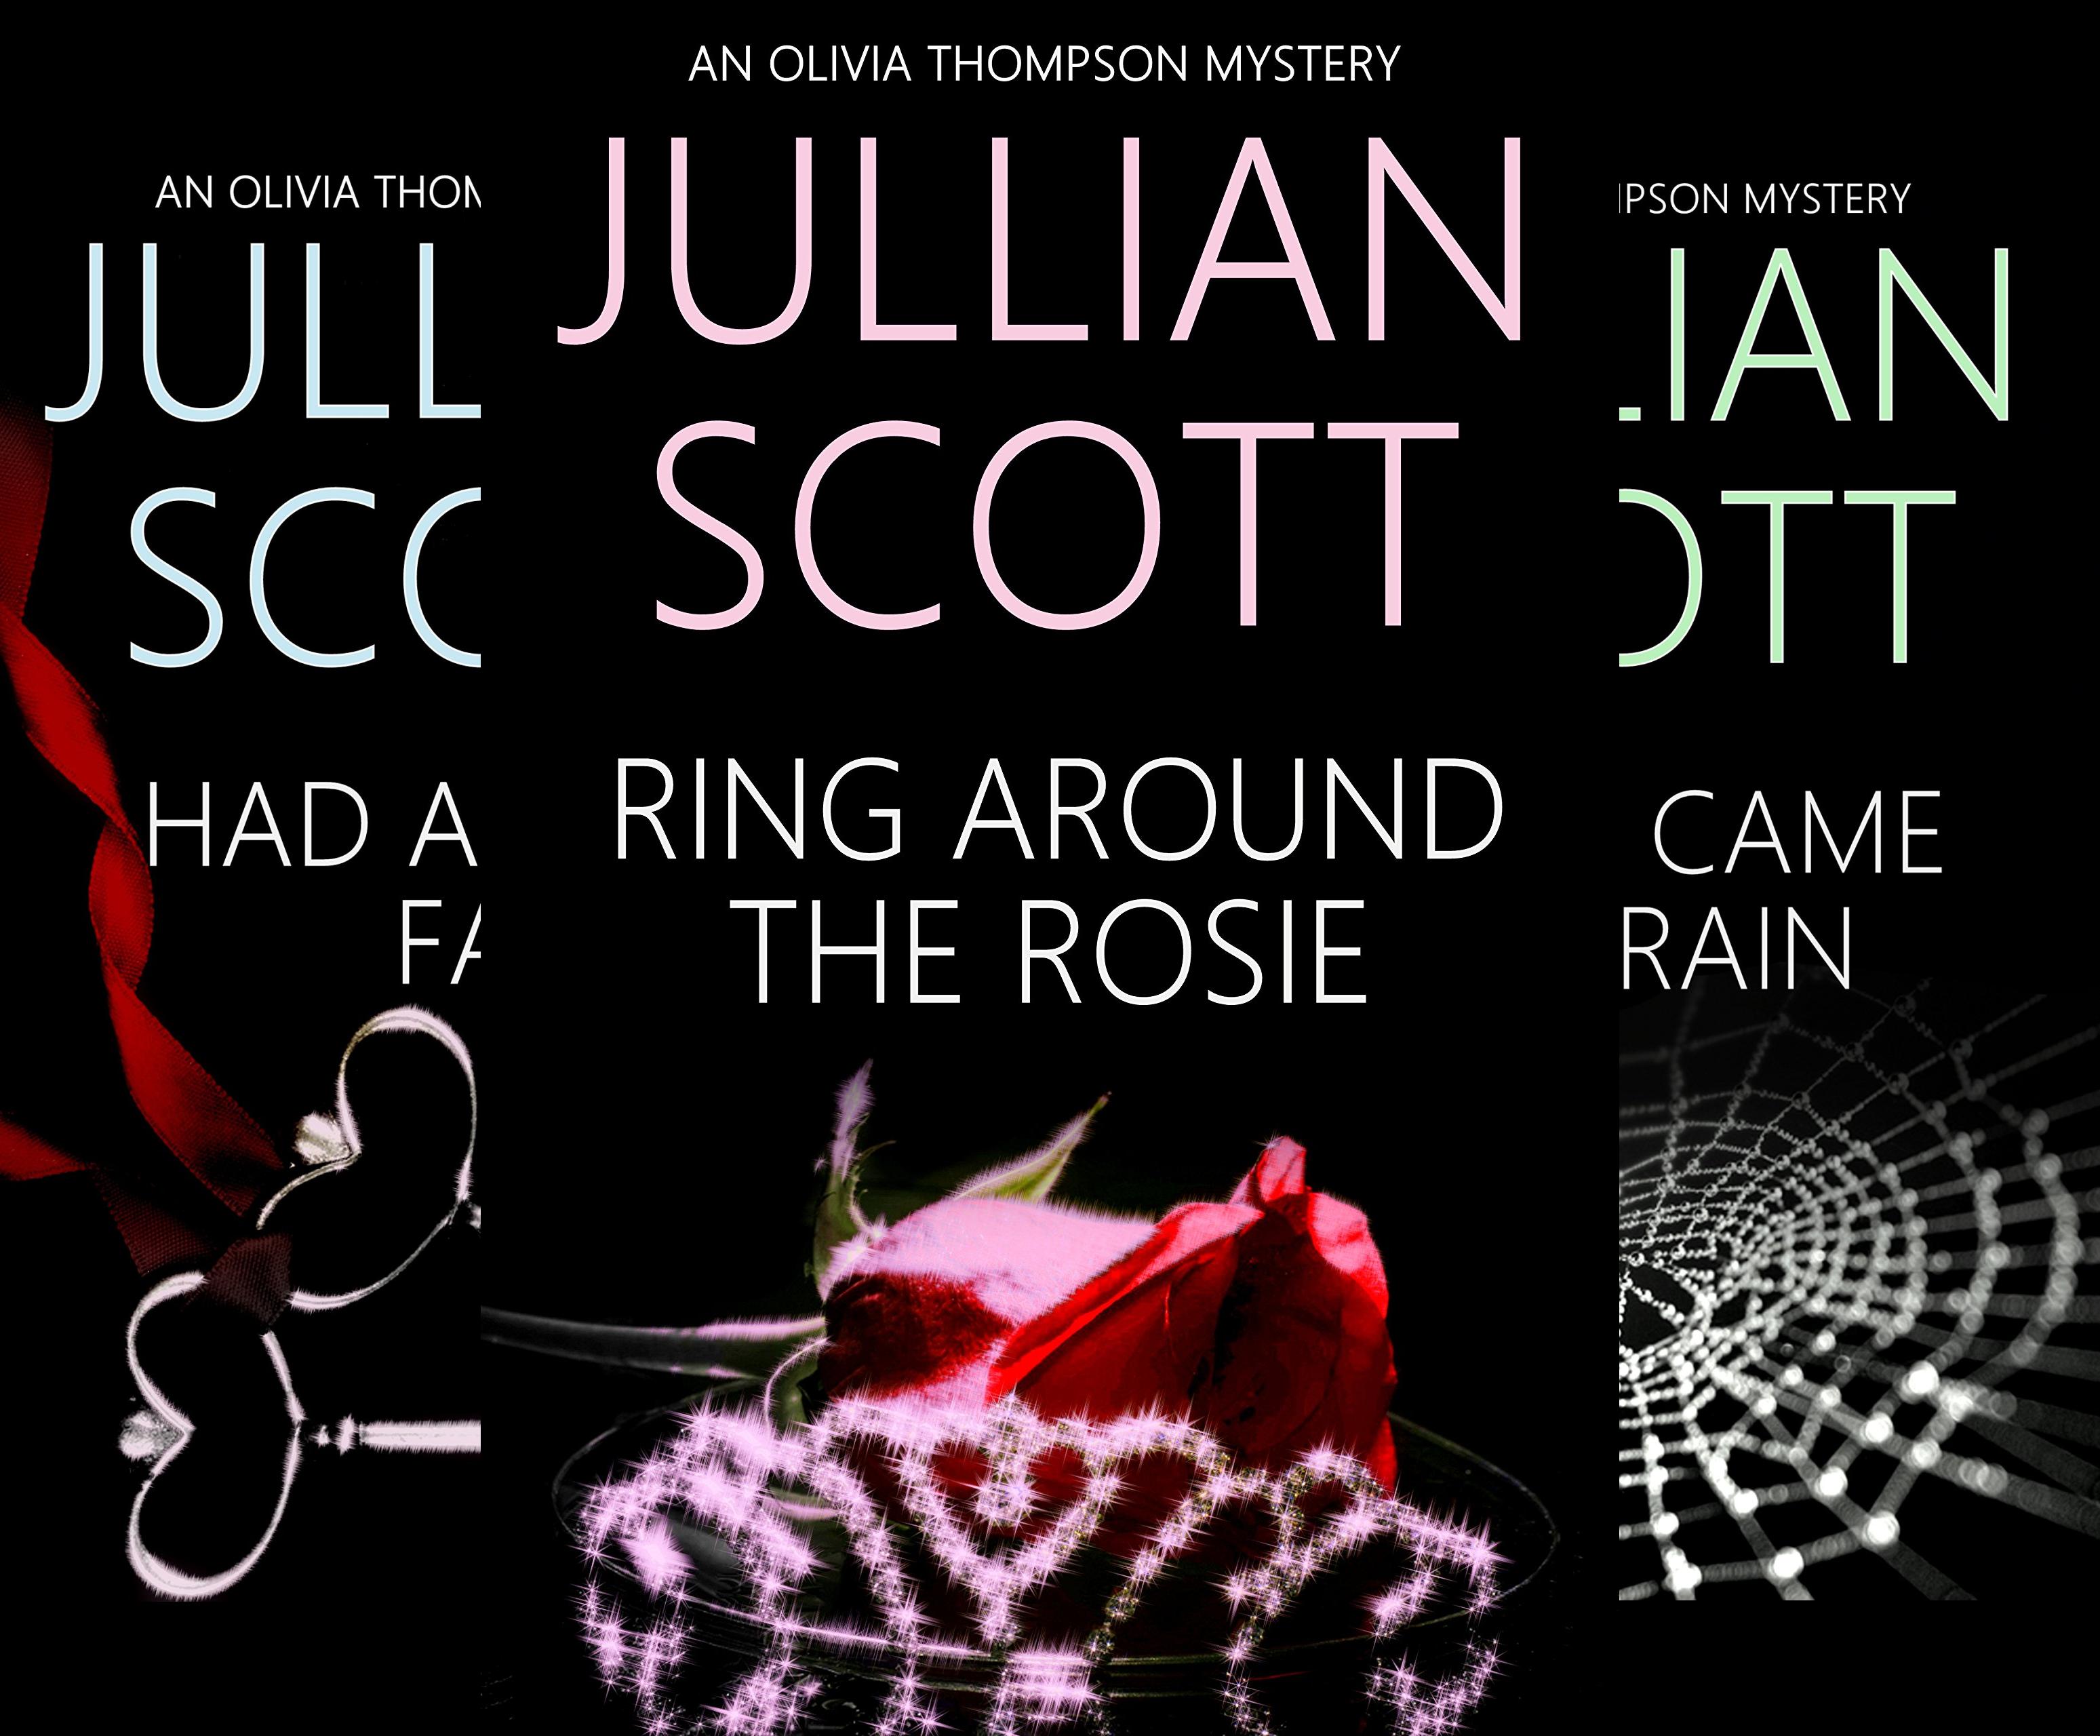 An Olivia Thompson Mystery (4 Book Series)